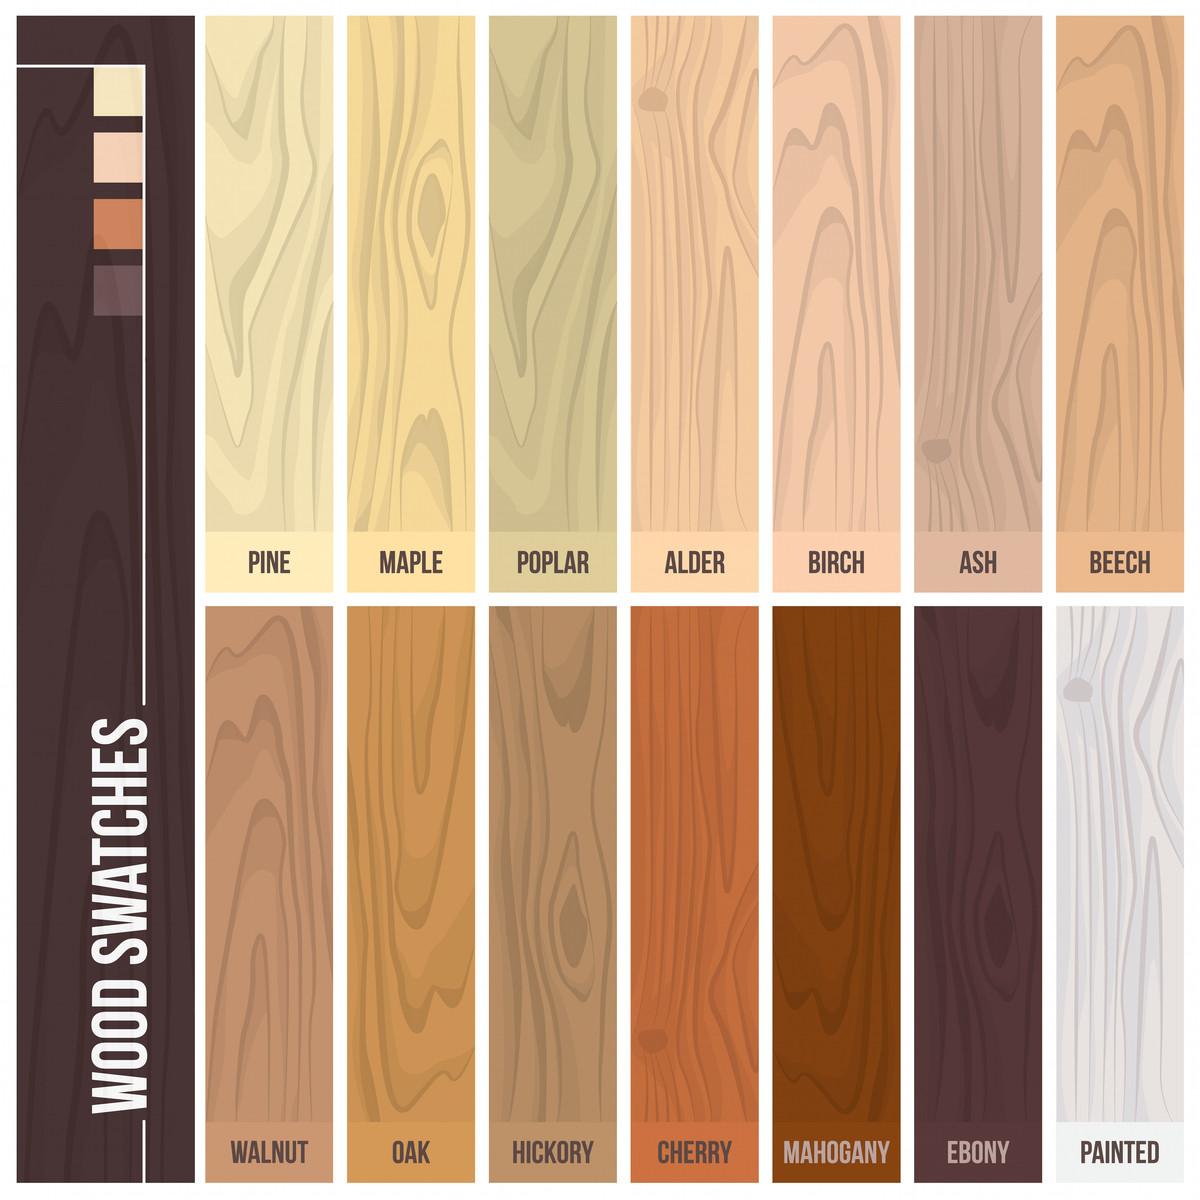 hardwood floor stairs installation video of 12 types of hardwood flooring species styles edging dimensions pertaining to types of hardwood flooring illustrated guide